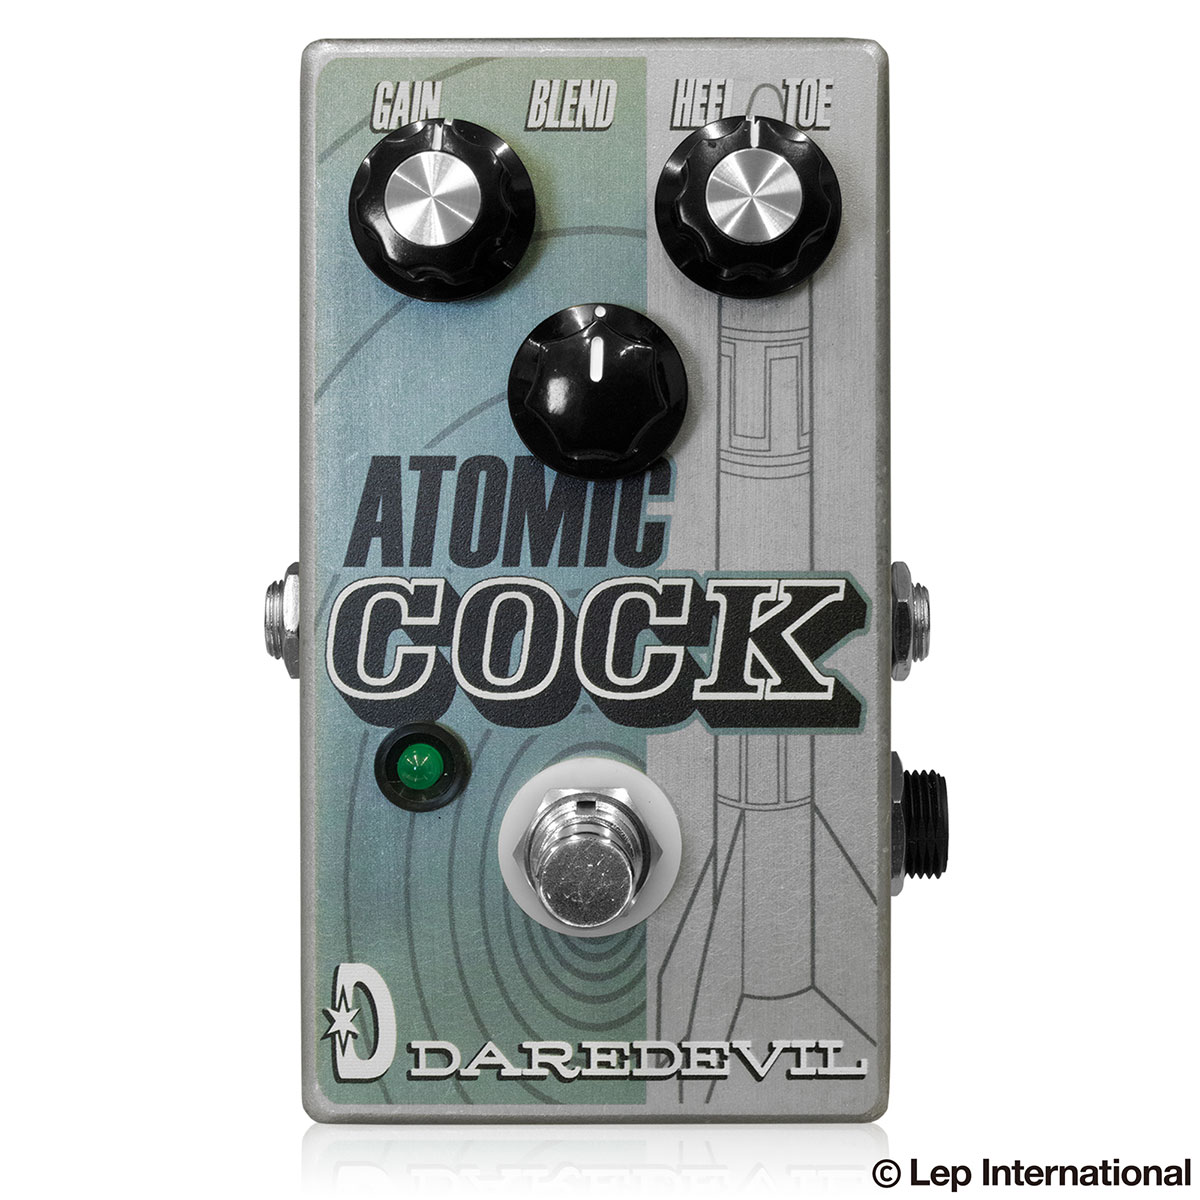 DAW・DTM・レコーダー, シーケンサー・リズムマシン Daredevil Pedals Atomic Cock V2